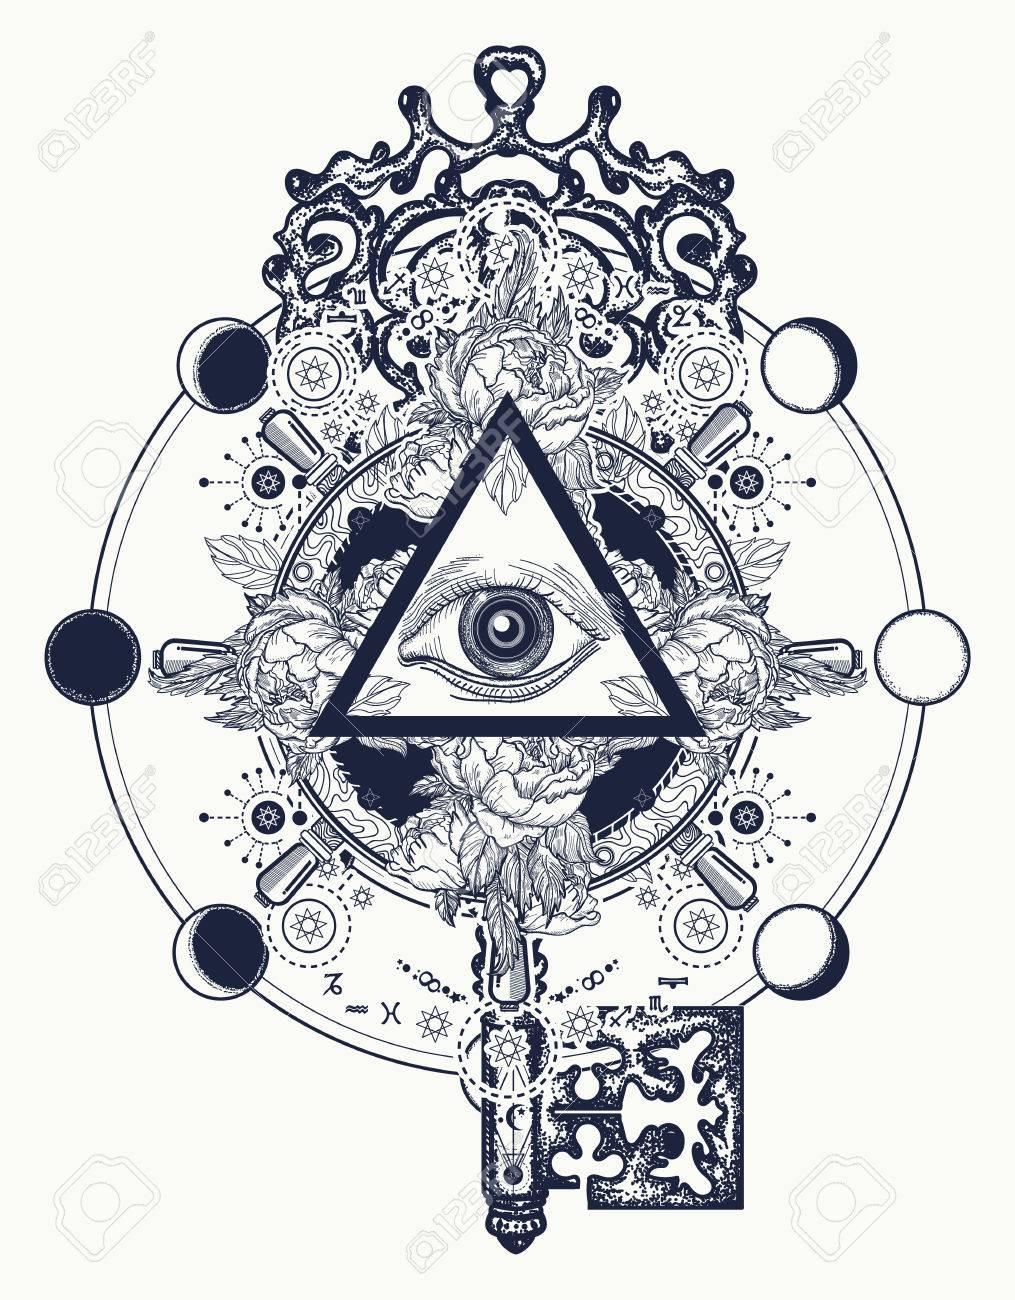 masonic eye and key